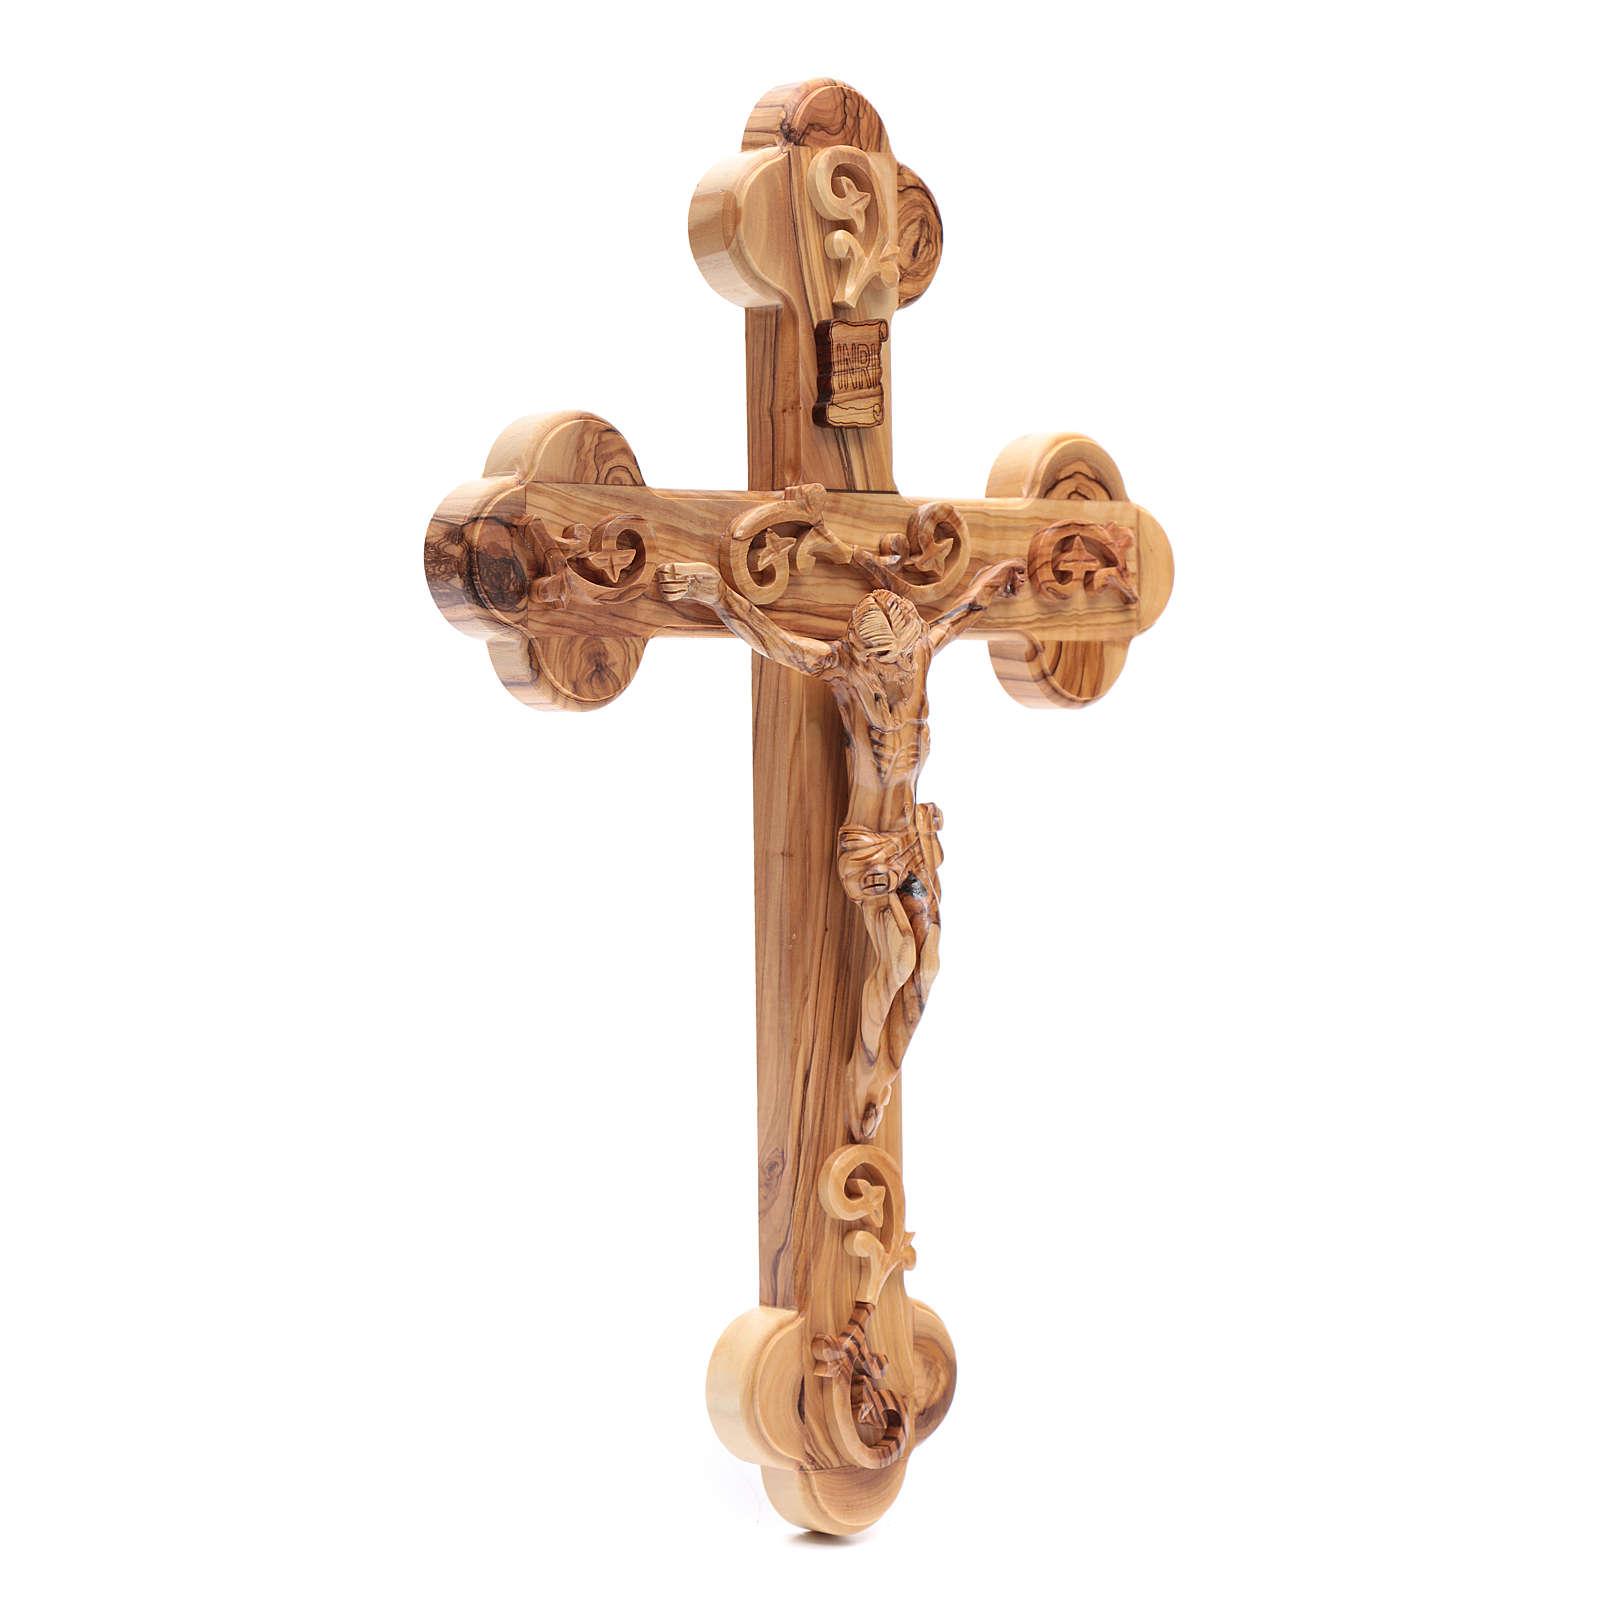 Croce Terrasanta ulivo naturale trilobata decorata 4